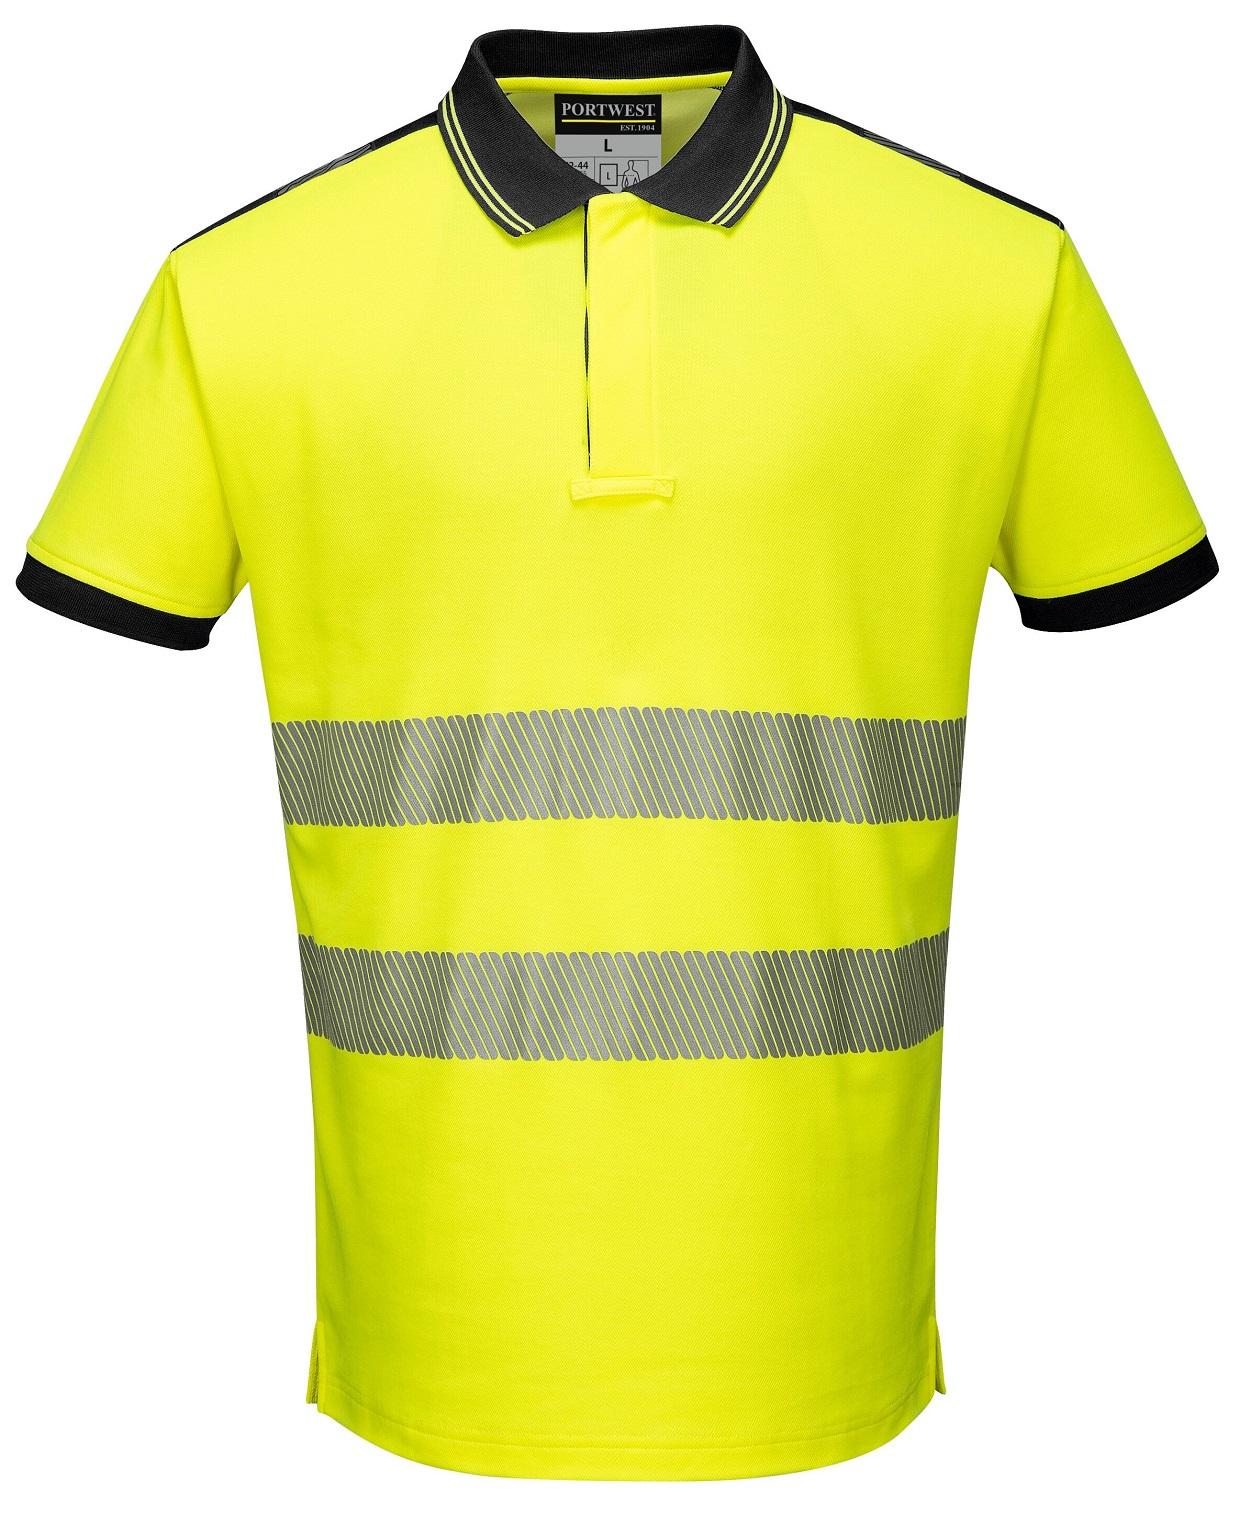 T180-yellow